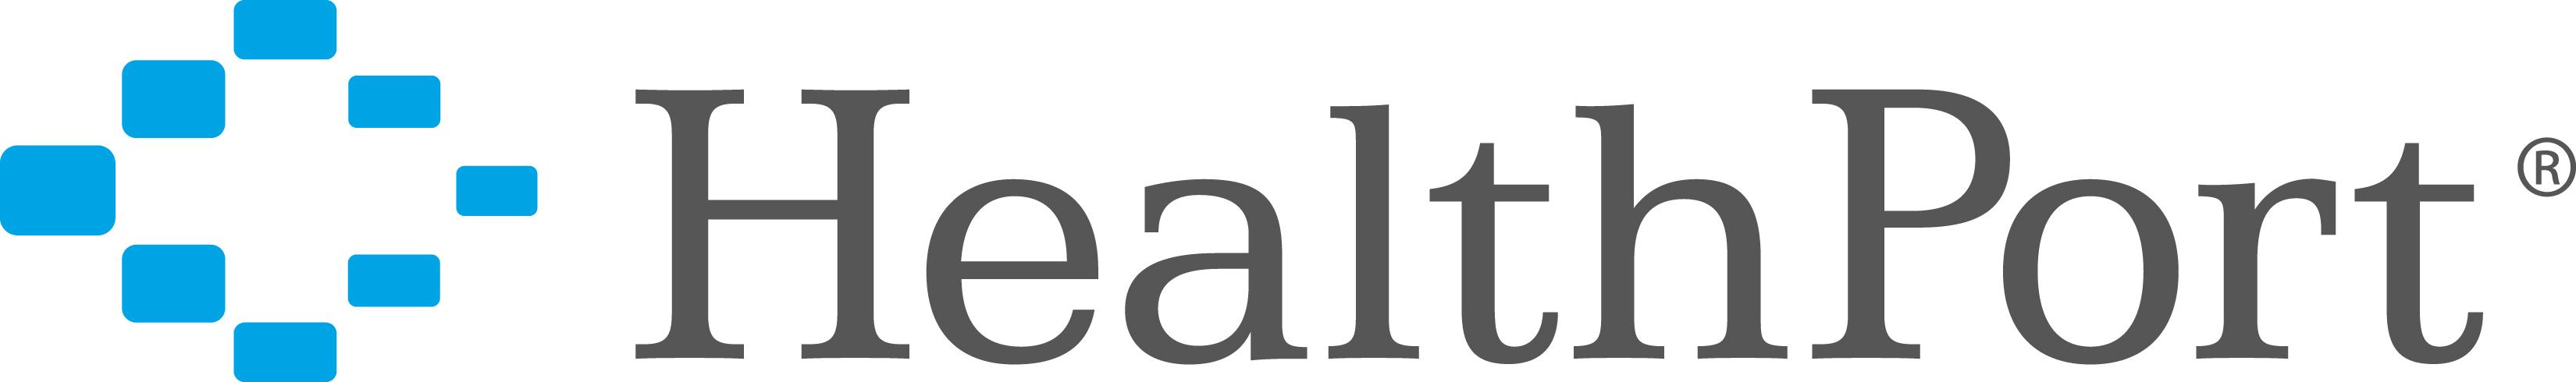 CIOX Health Talent Acquisition logo